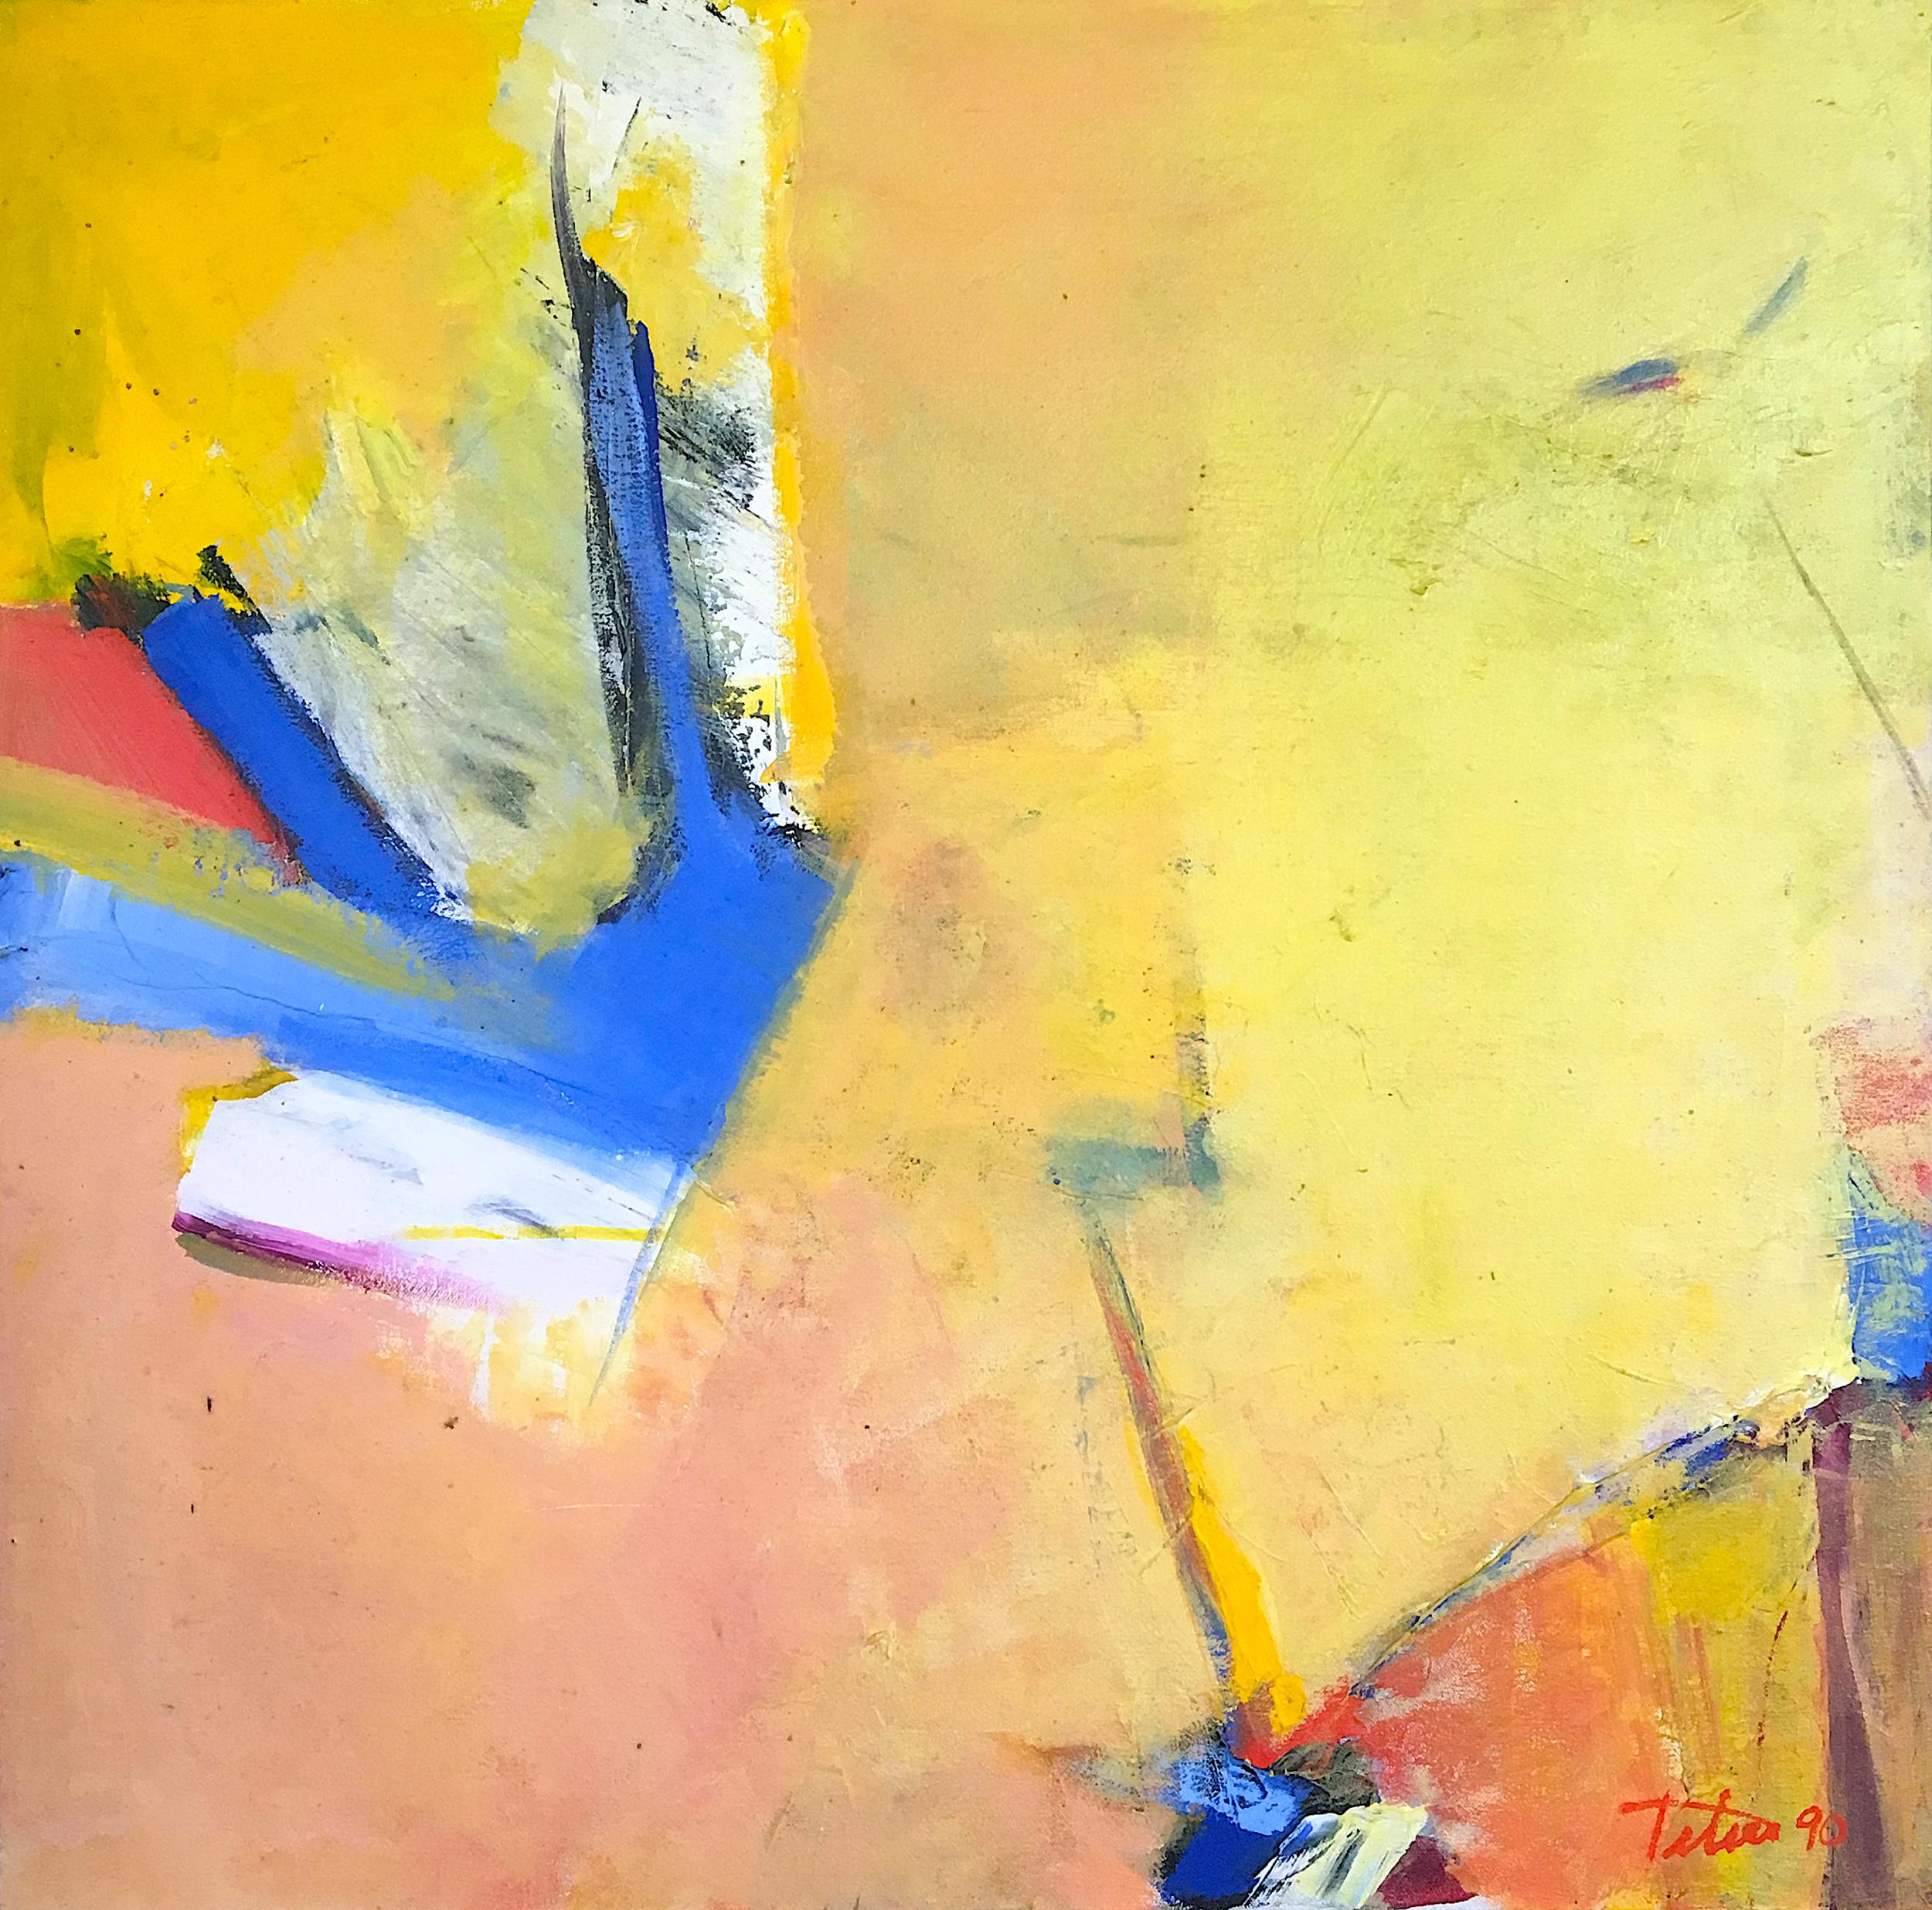 "Blue in Orbit • Oil on canvas • 24 x 24"""